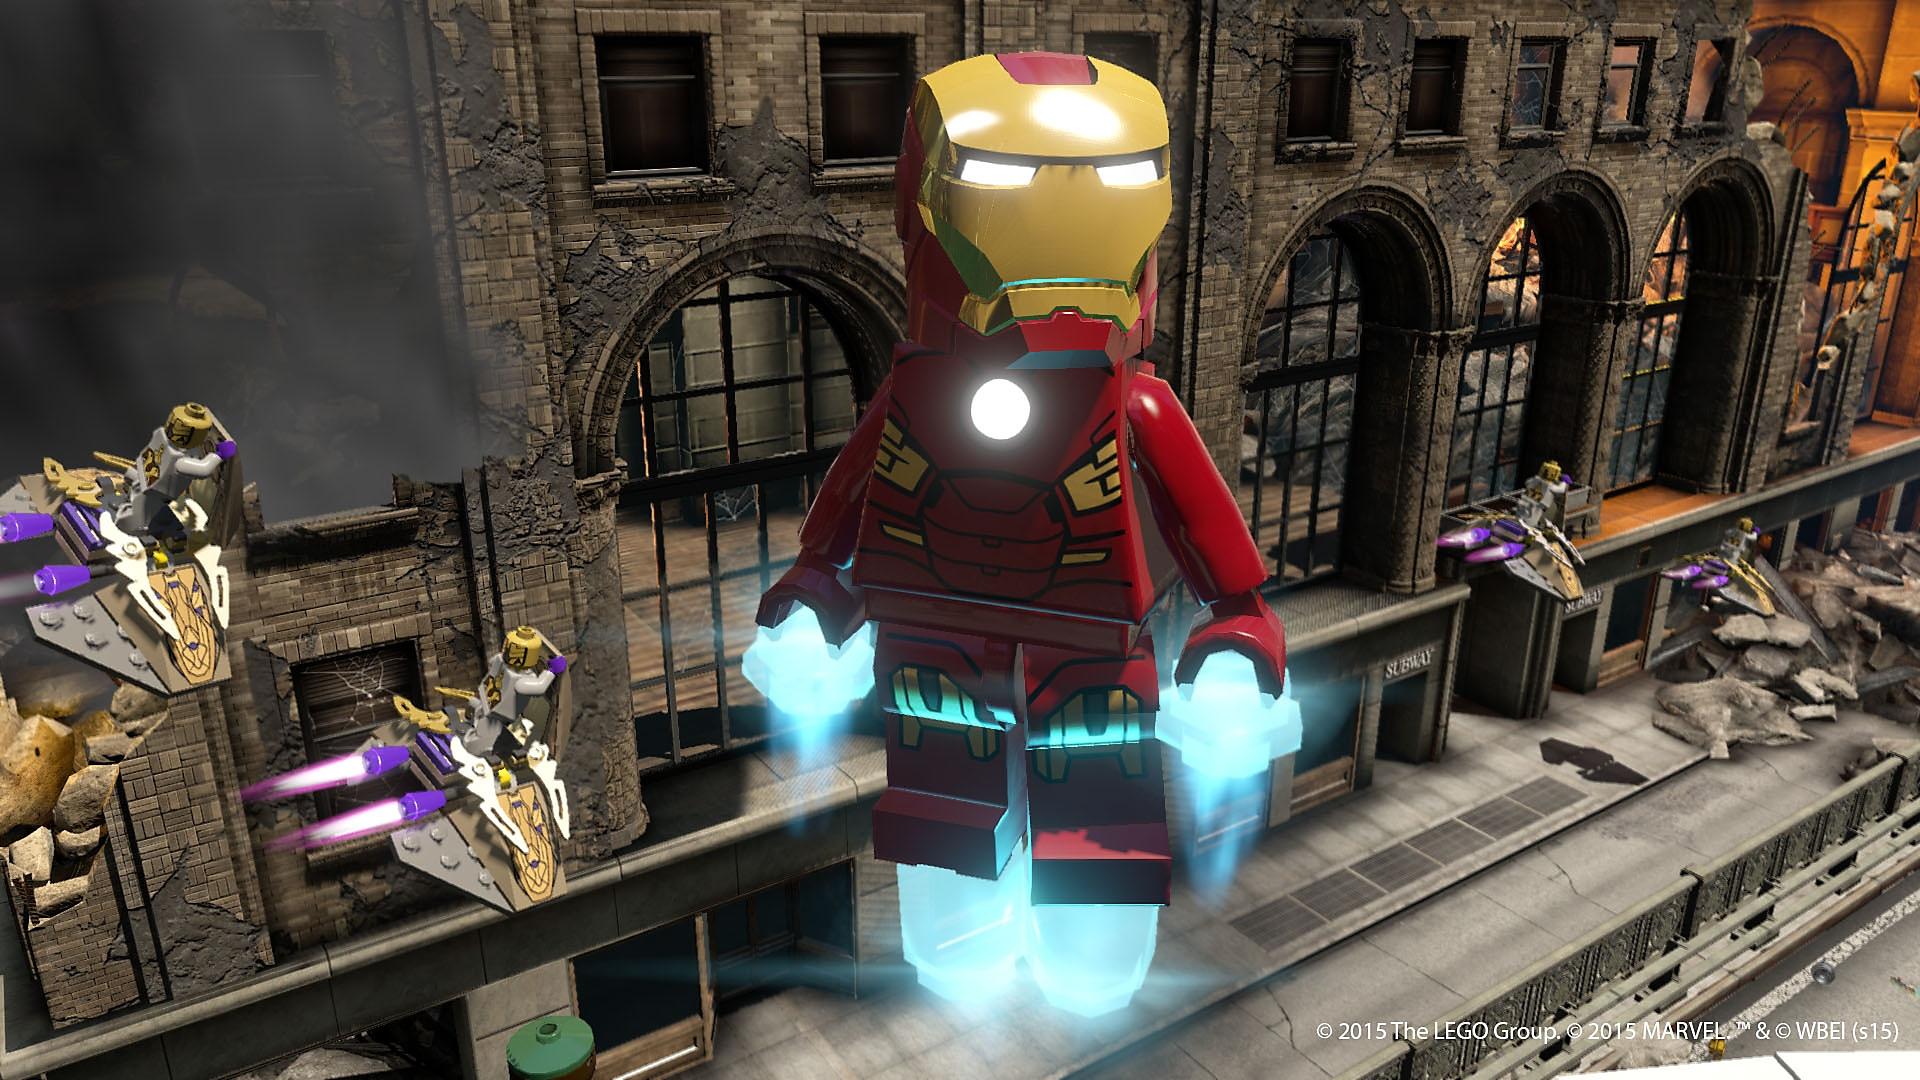 LEGO マーベル アベンジャーズ - Gallery Screenshot 3